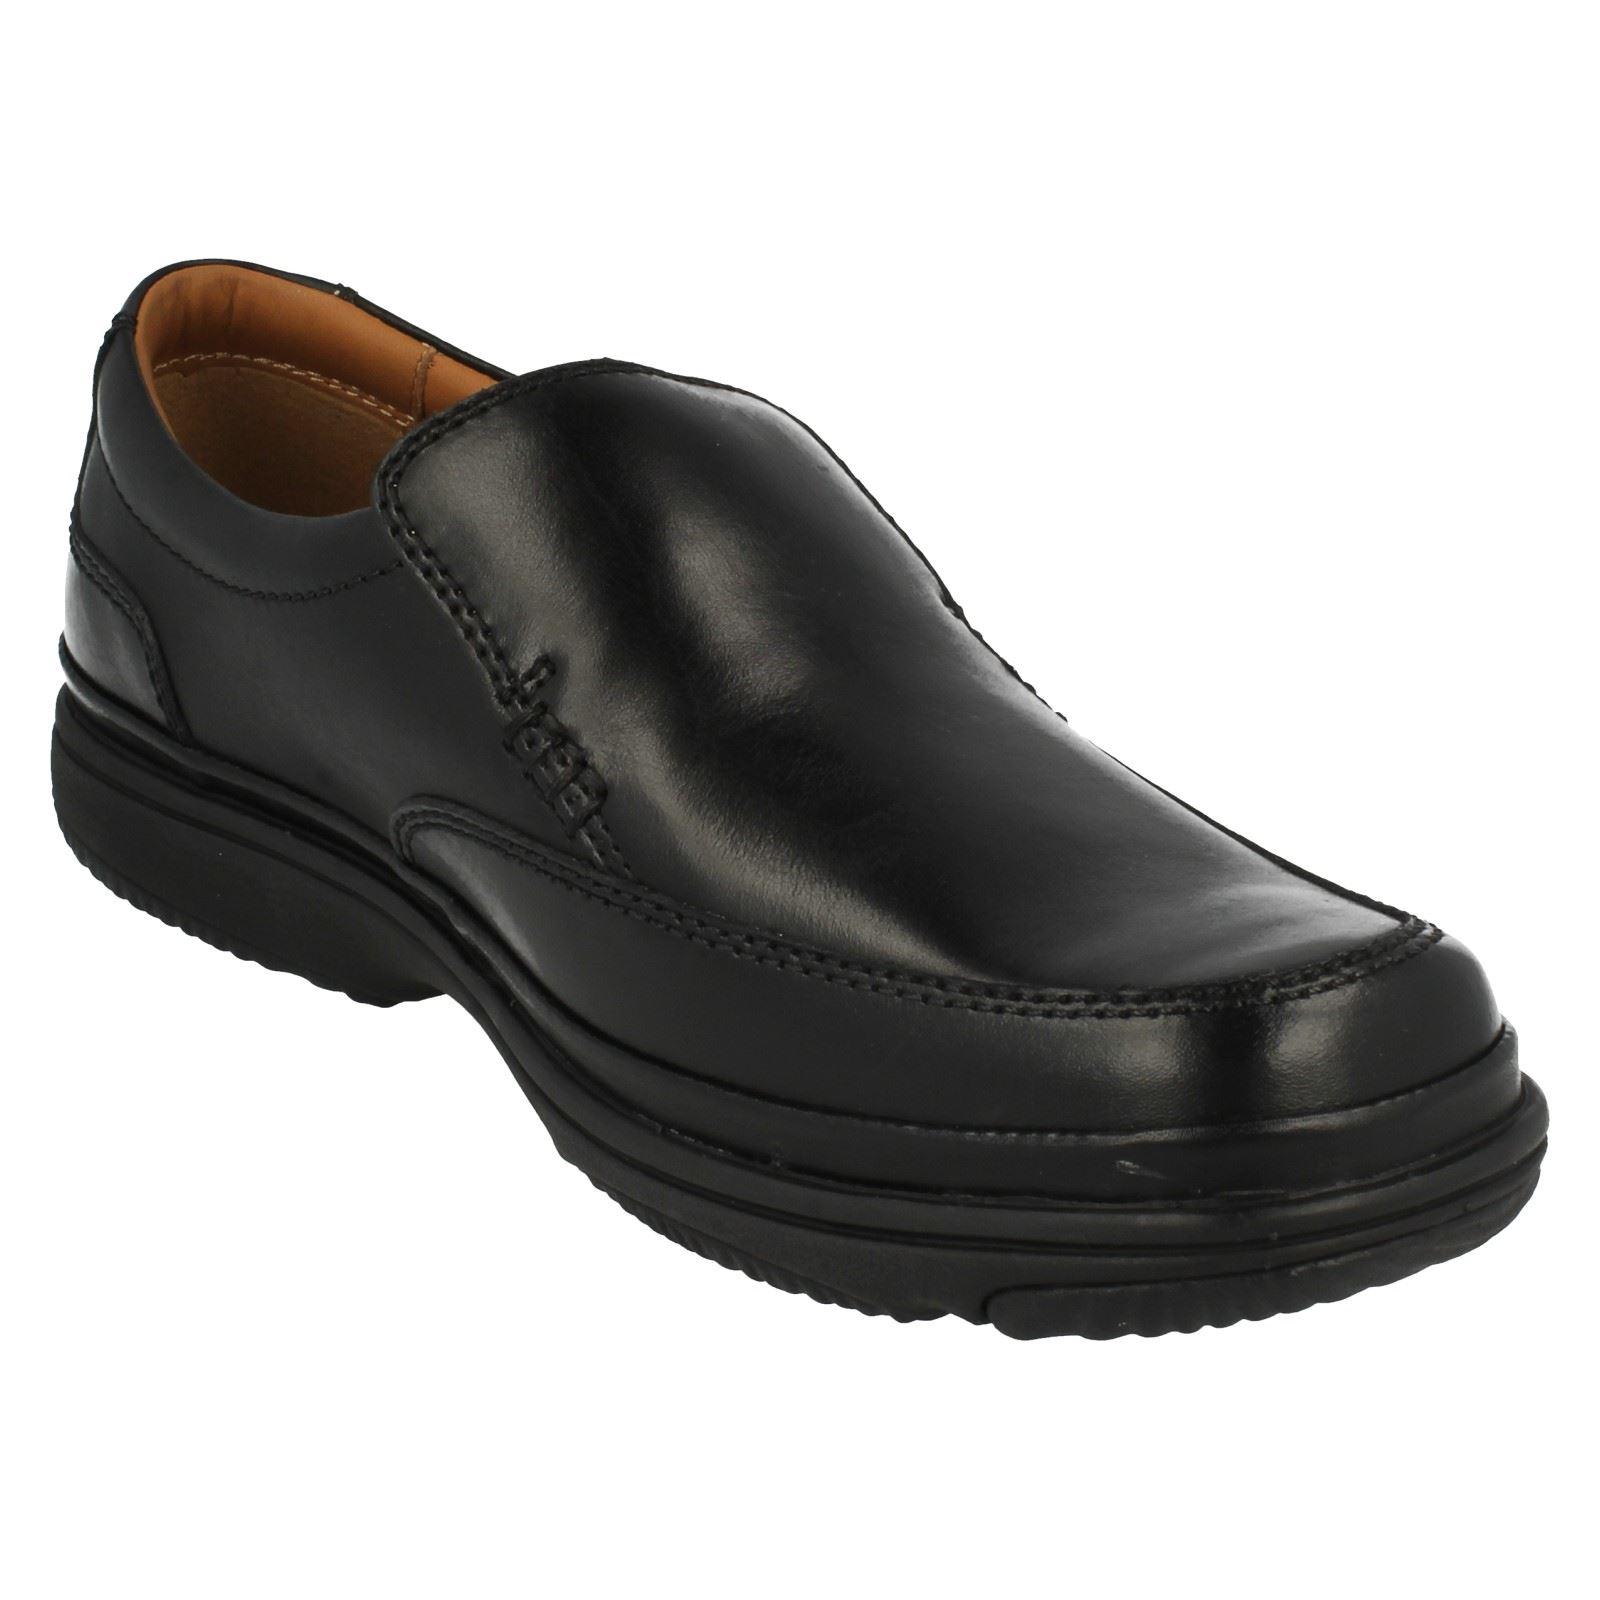 Clarks Flexlight Mens Shoes